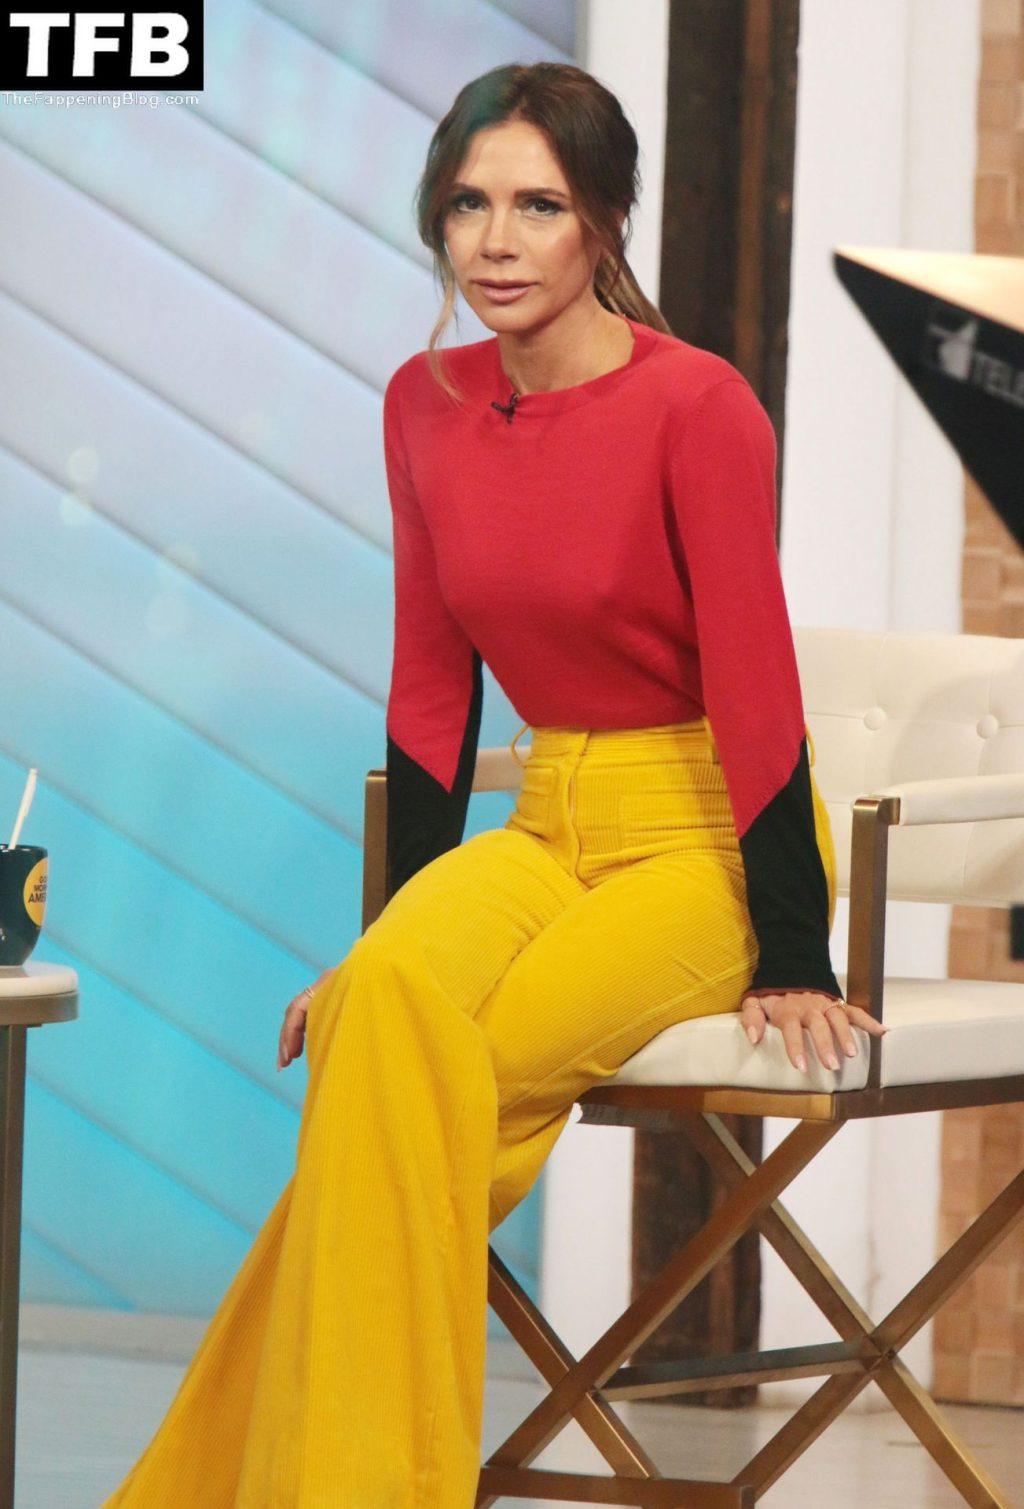 Victoria Beckham Looks Stylish in NYC (75 Photos)